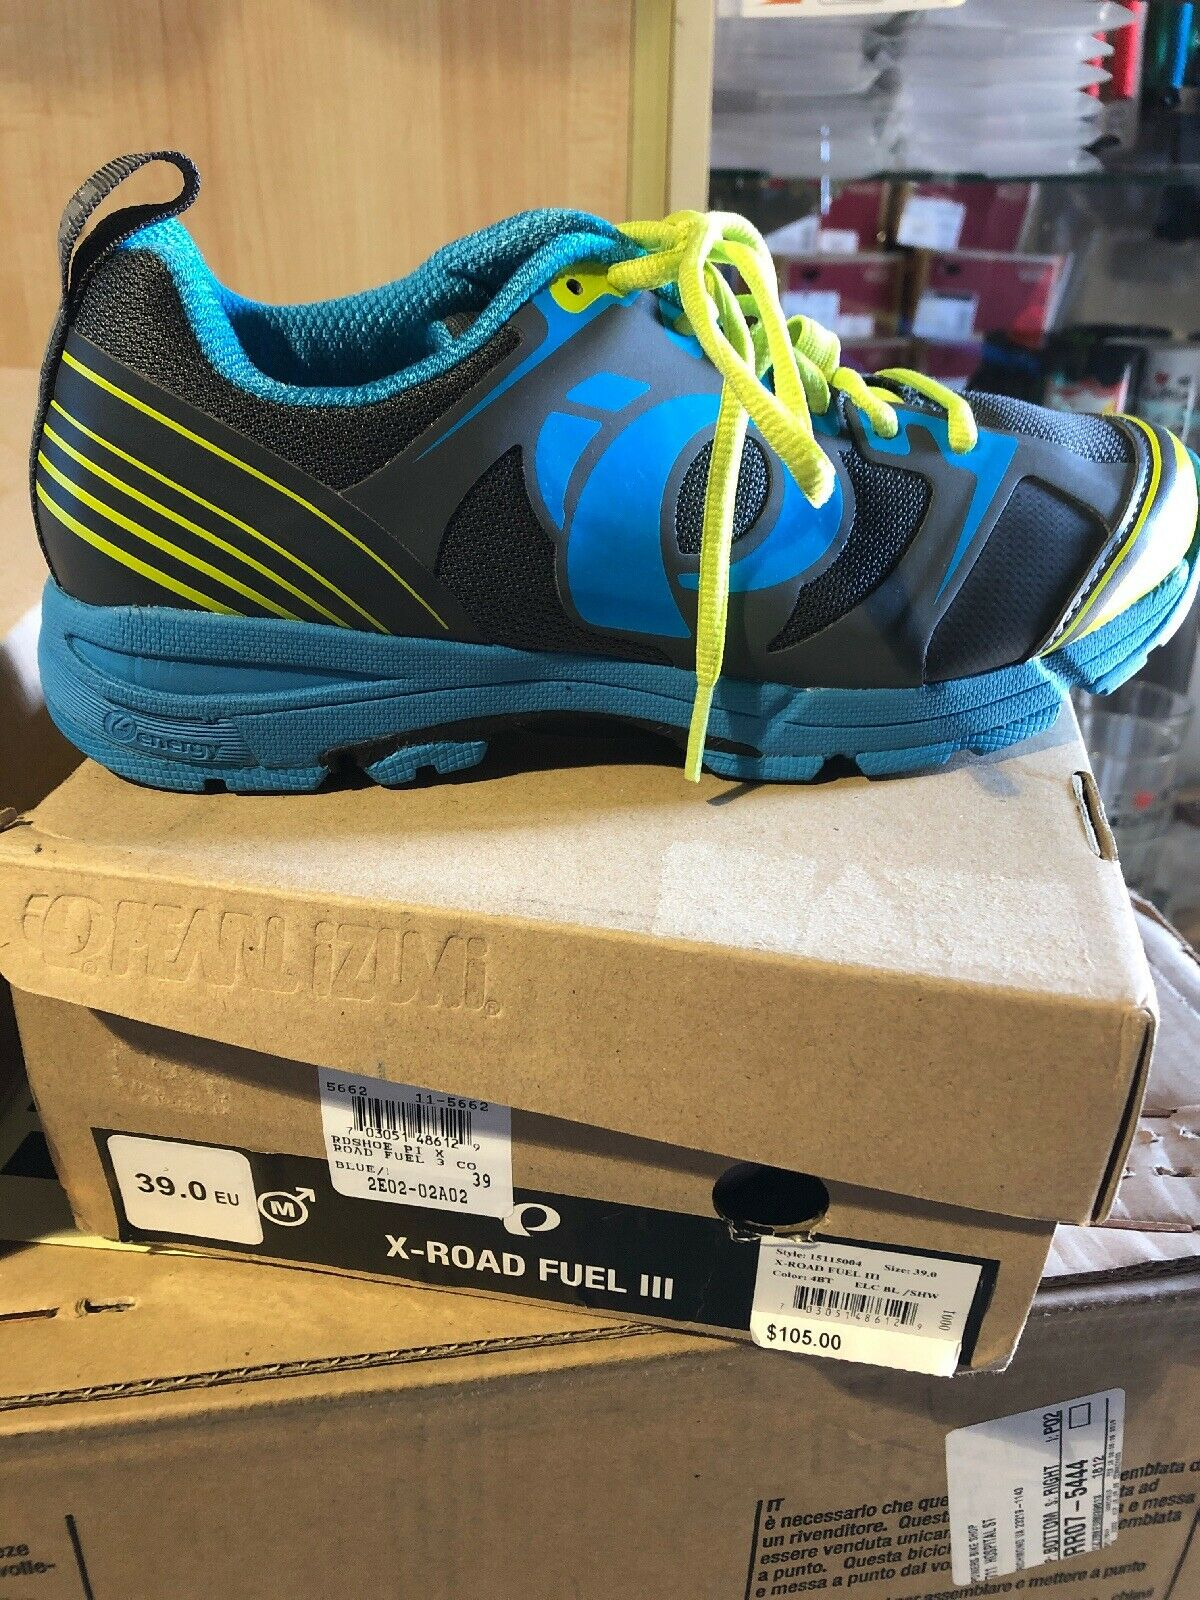 Brand new Pearl Izumi X-Road Fuel III Men's MTB Casual shoes SIZE shimano